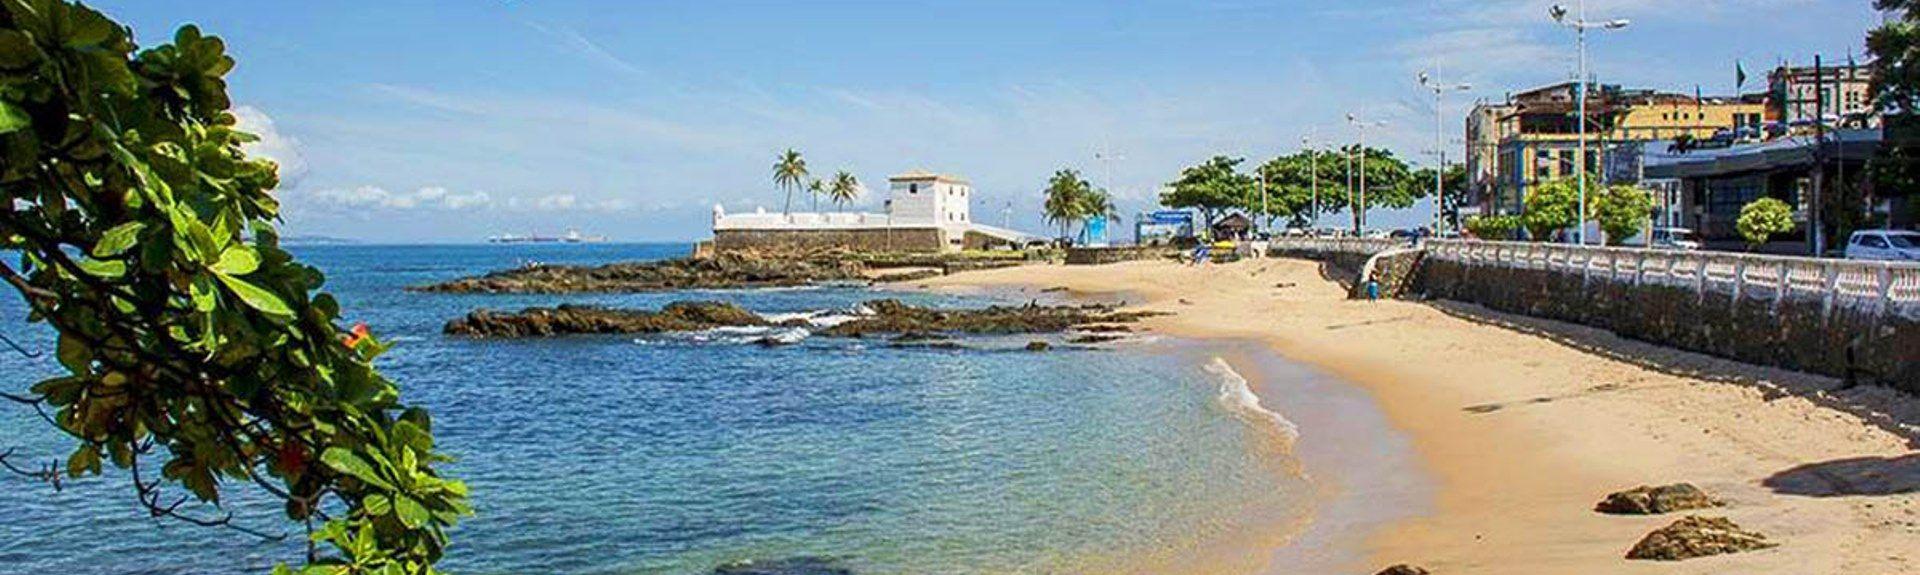 Penha Beach, Vera Cruz, Bahia (state), Brazil